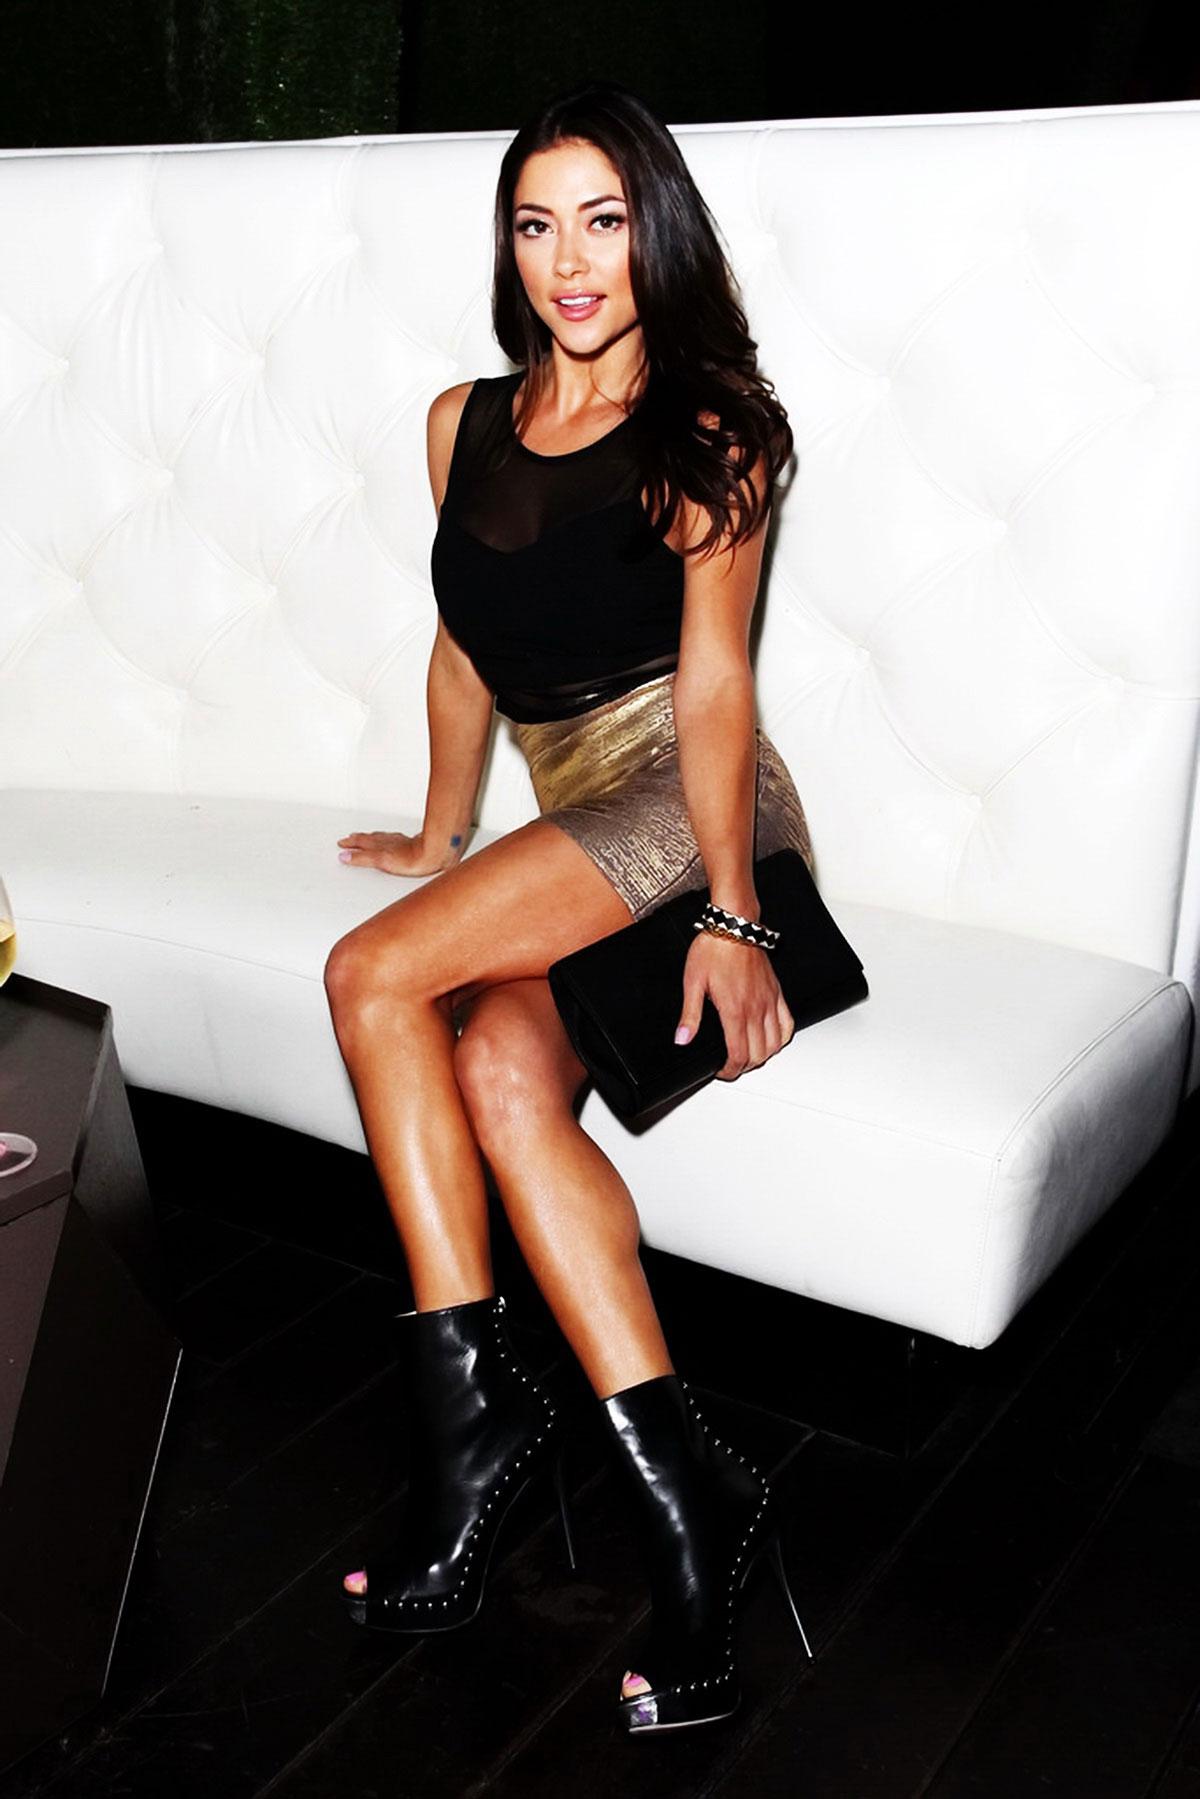 Arianny Celeste attends OK! Magazine's annual SO SEXY event